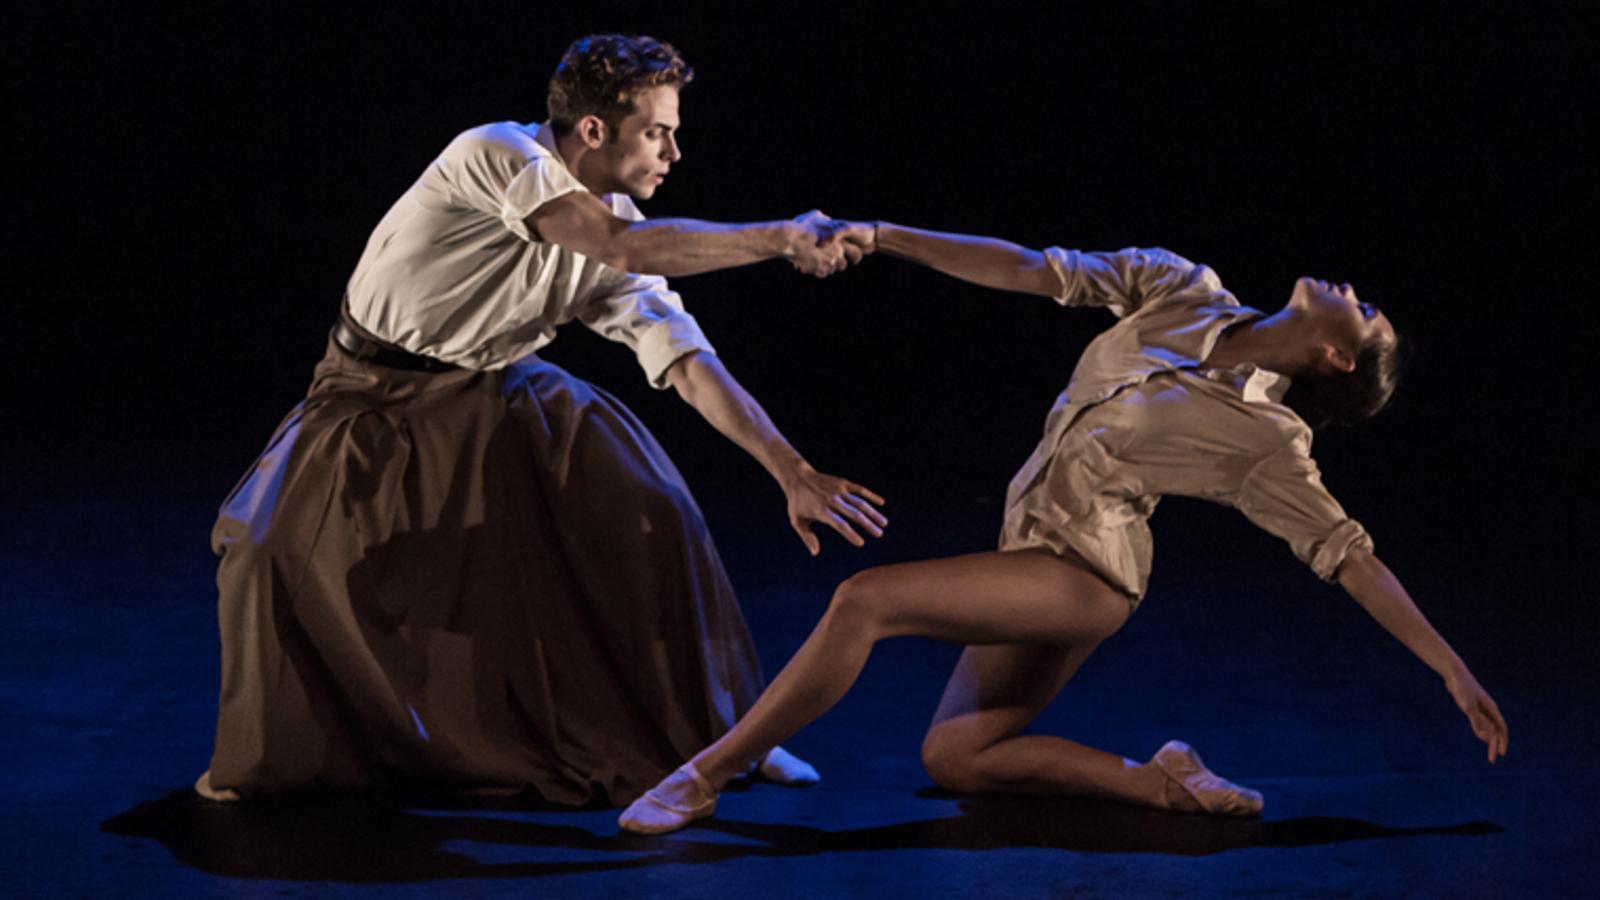 Dos ballarins de la companyia IT Dansa.